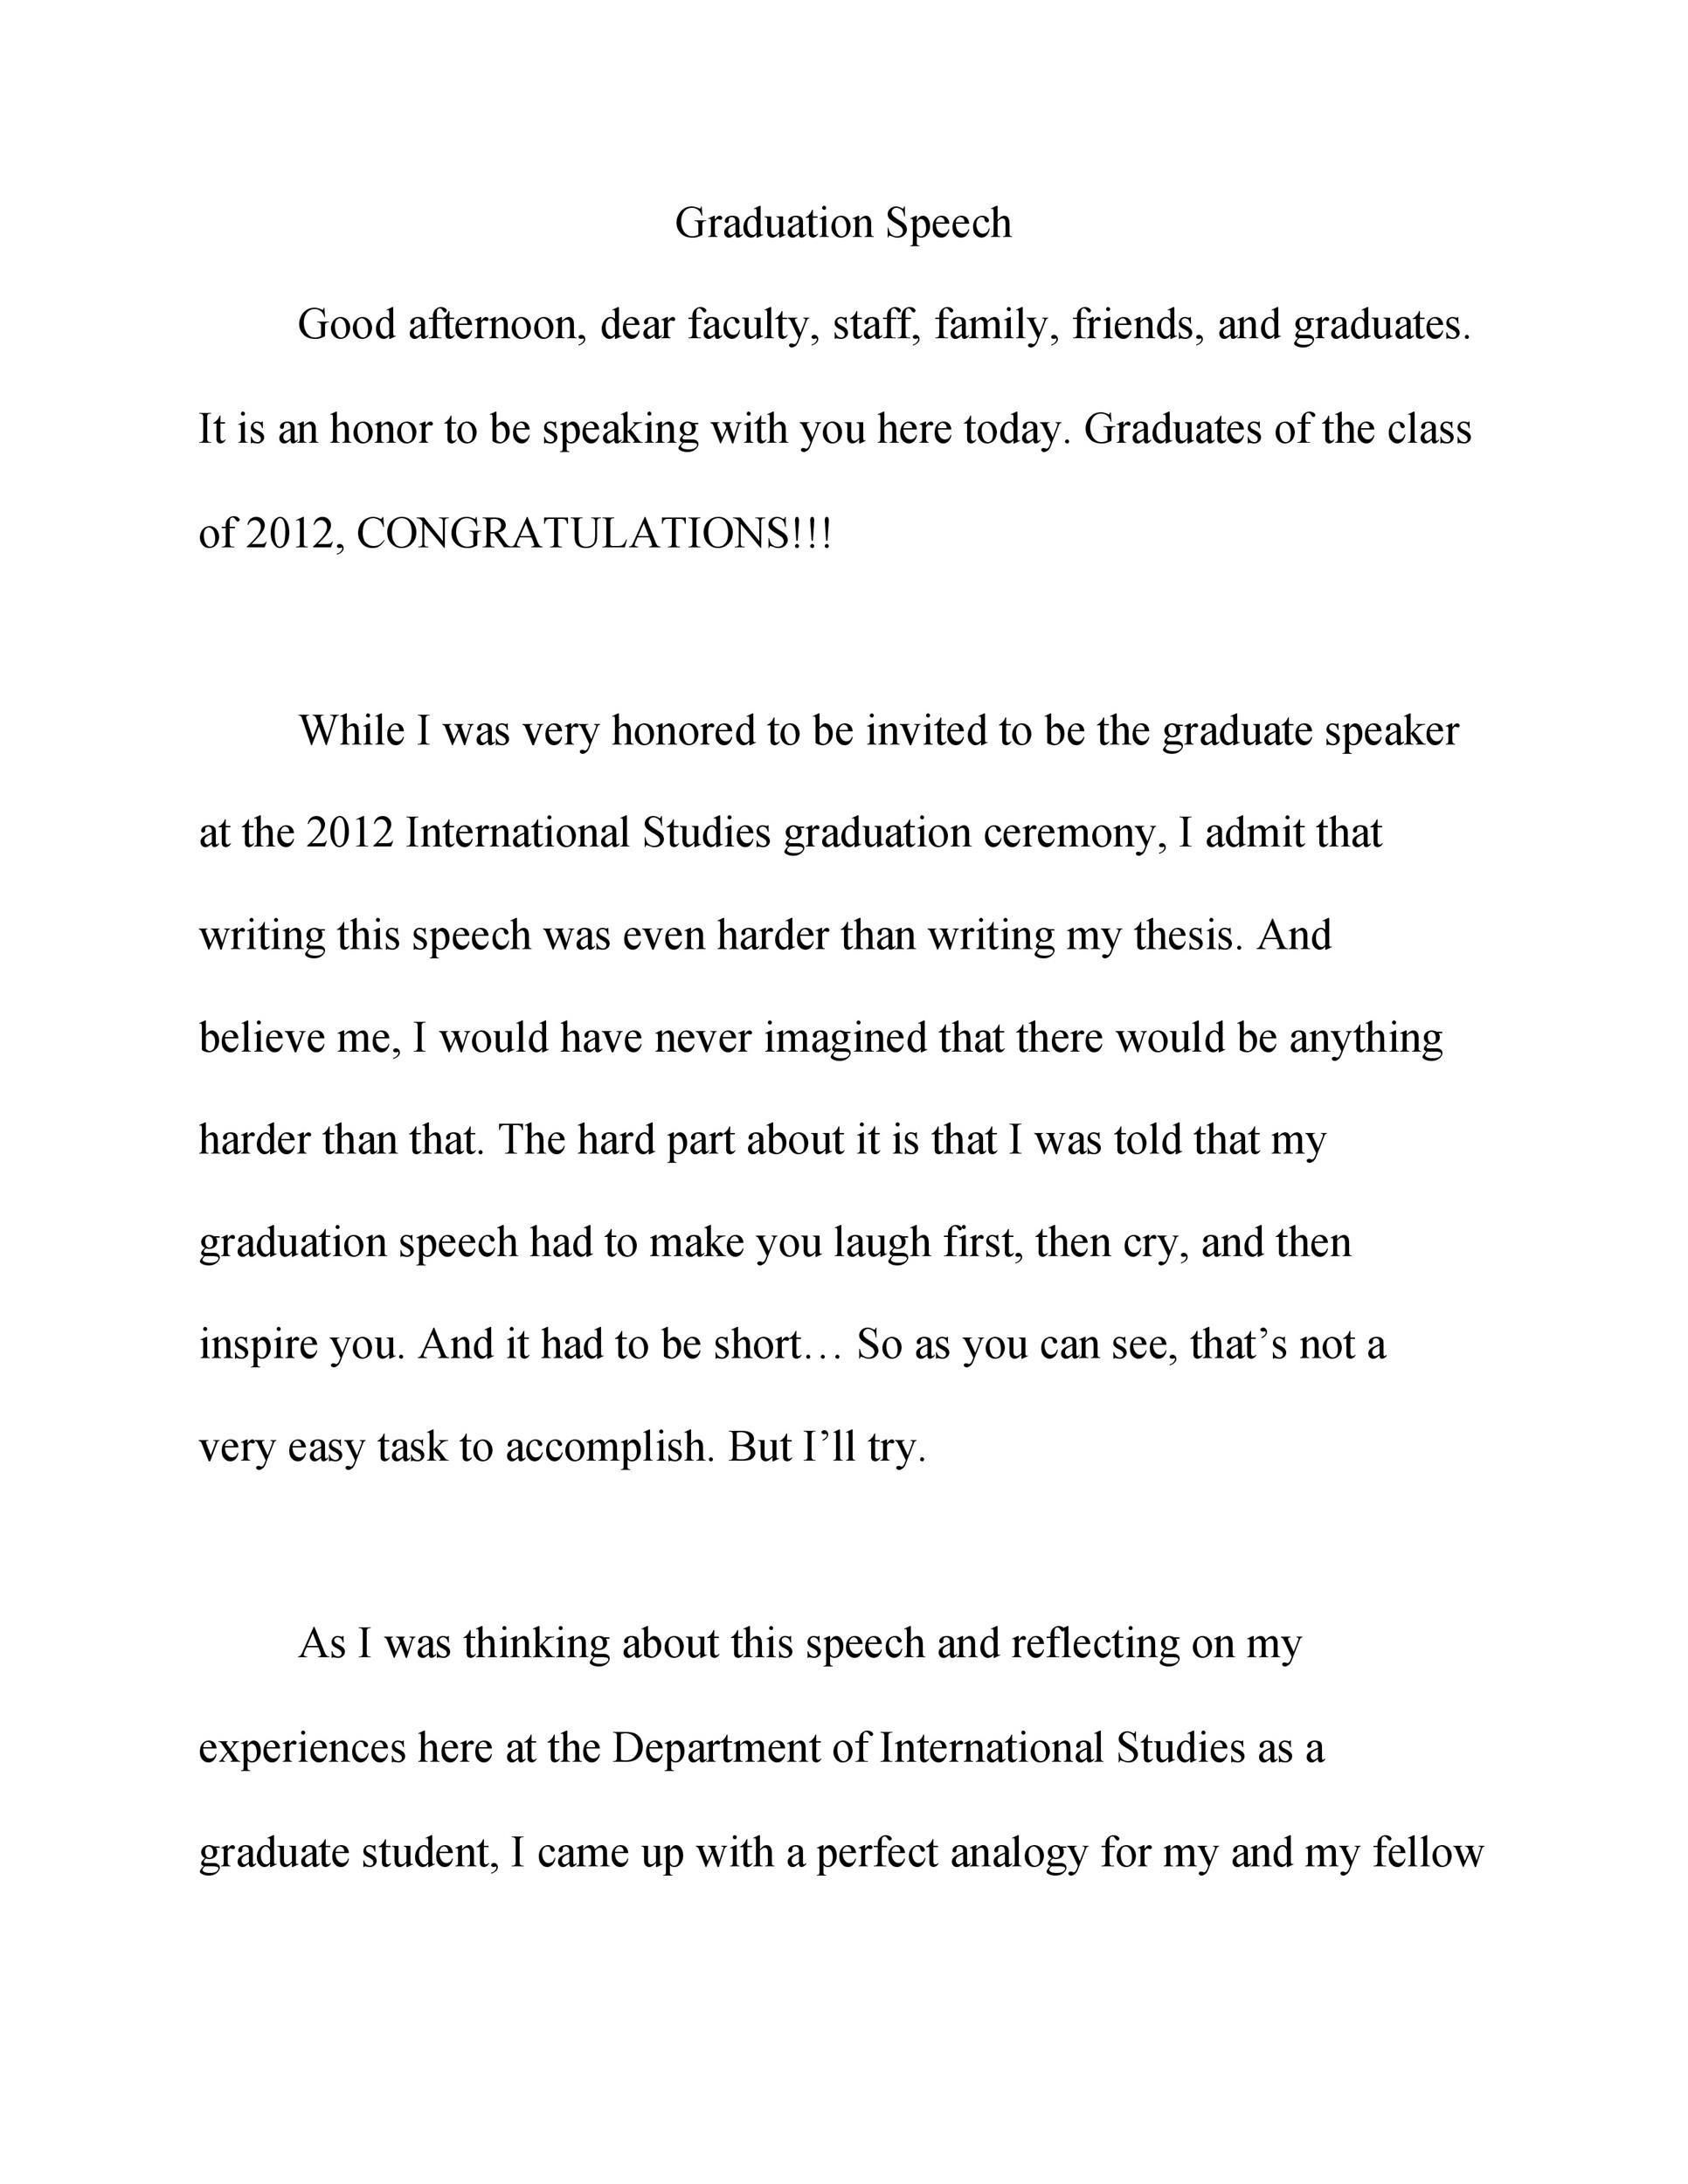 Free graduation speech example 31